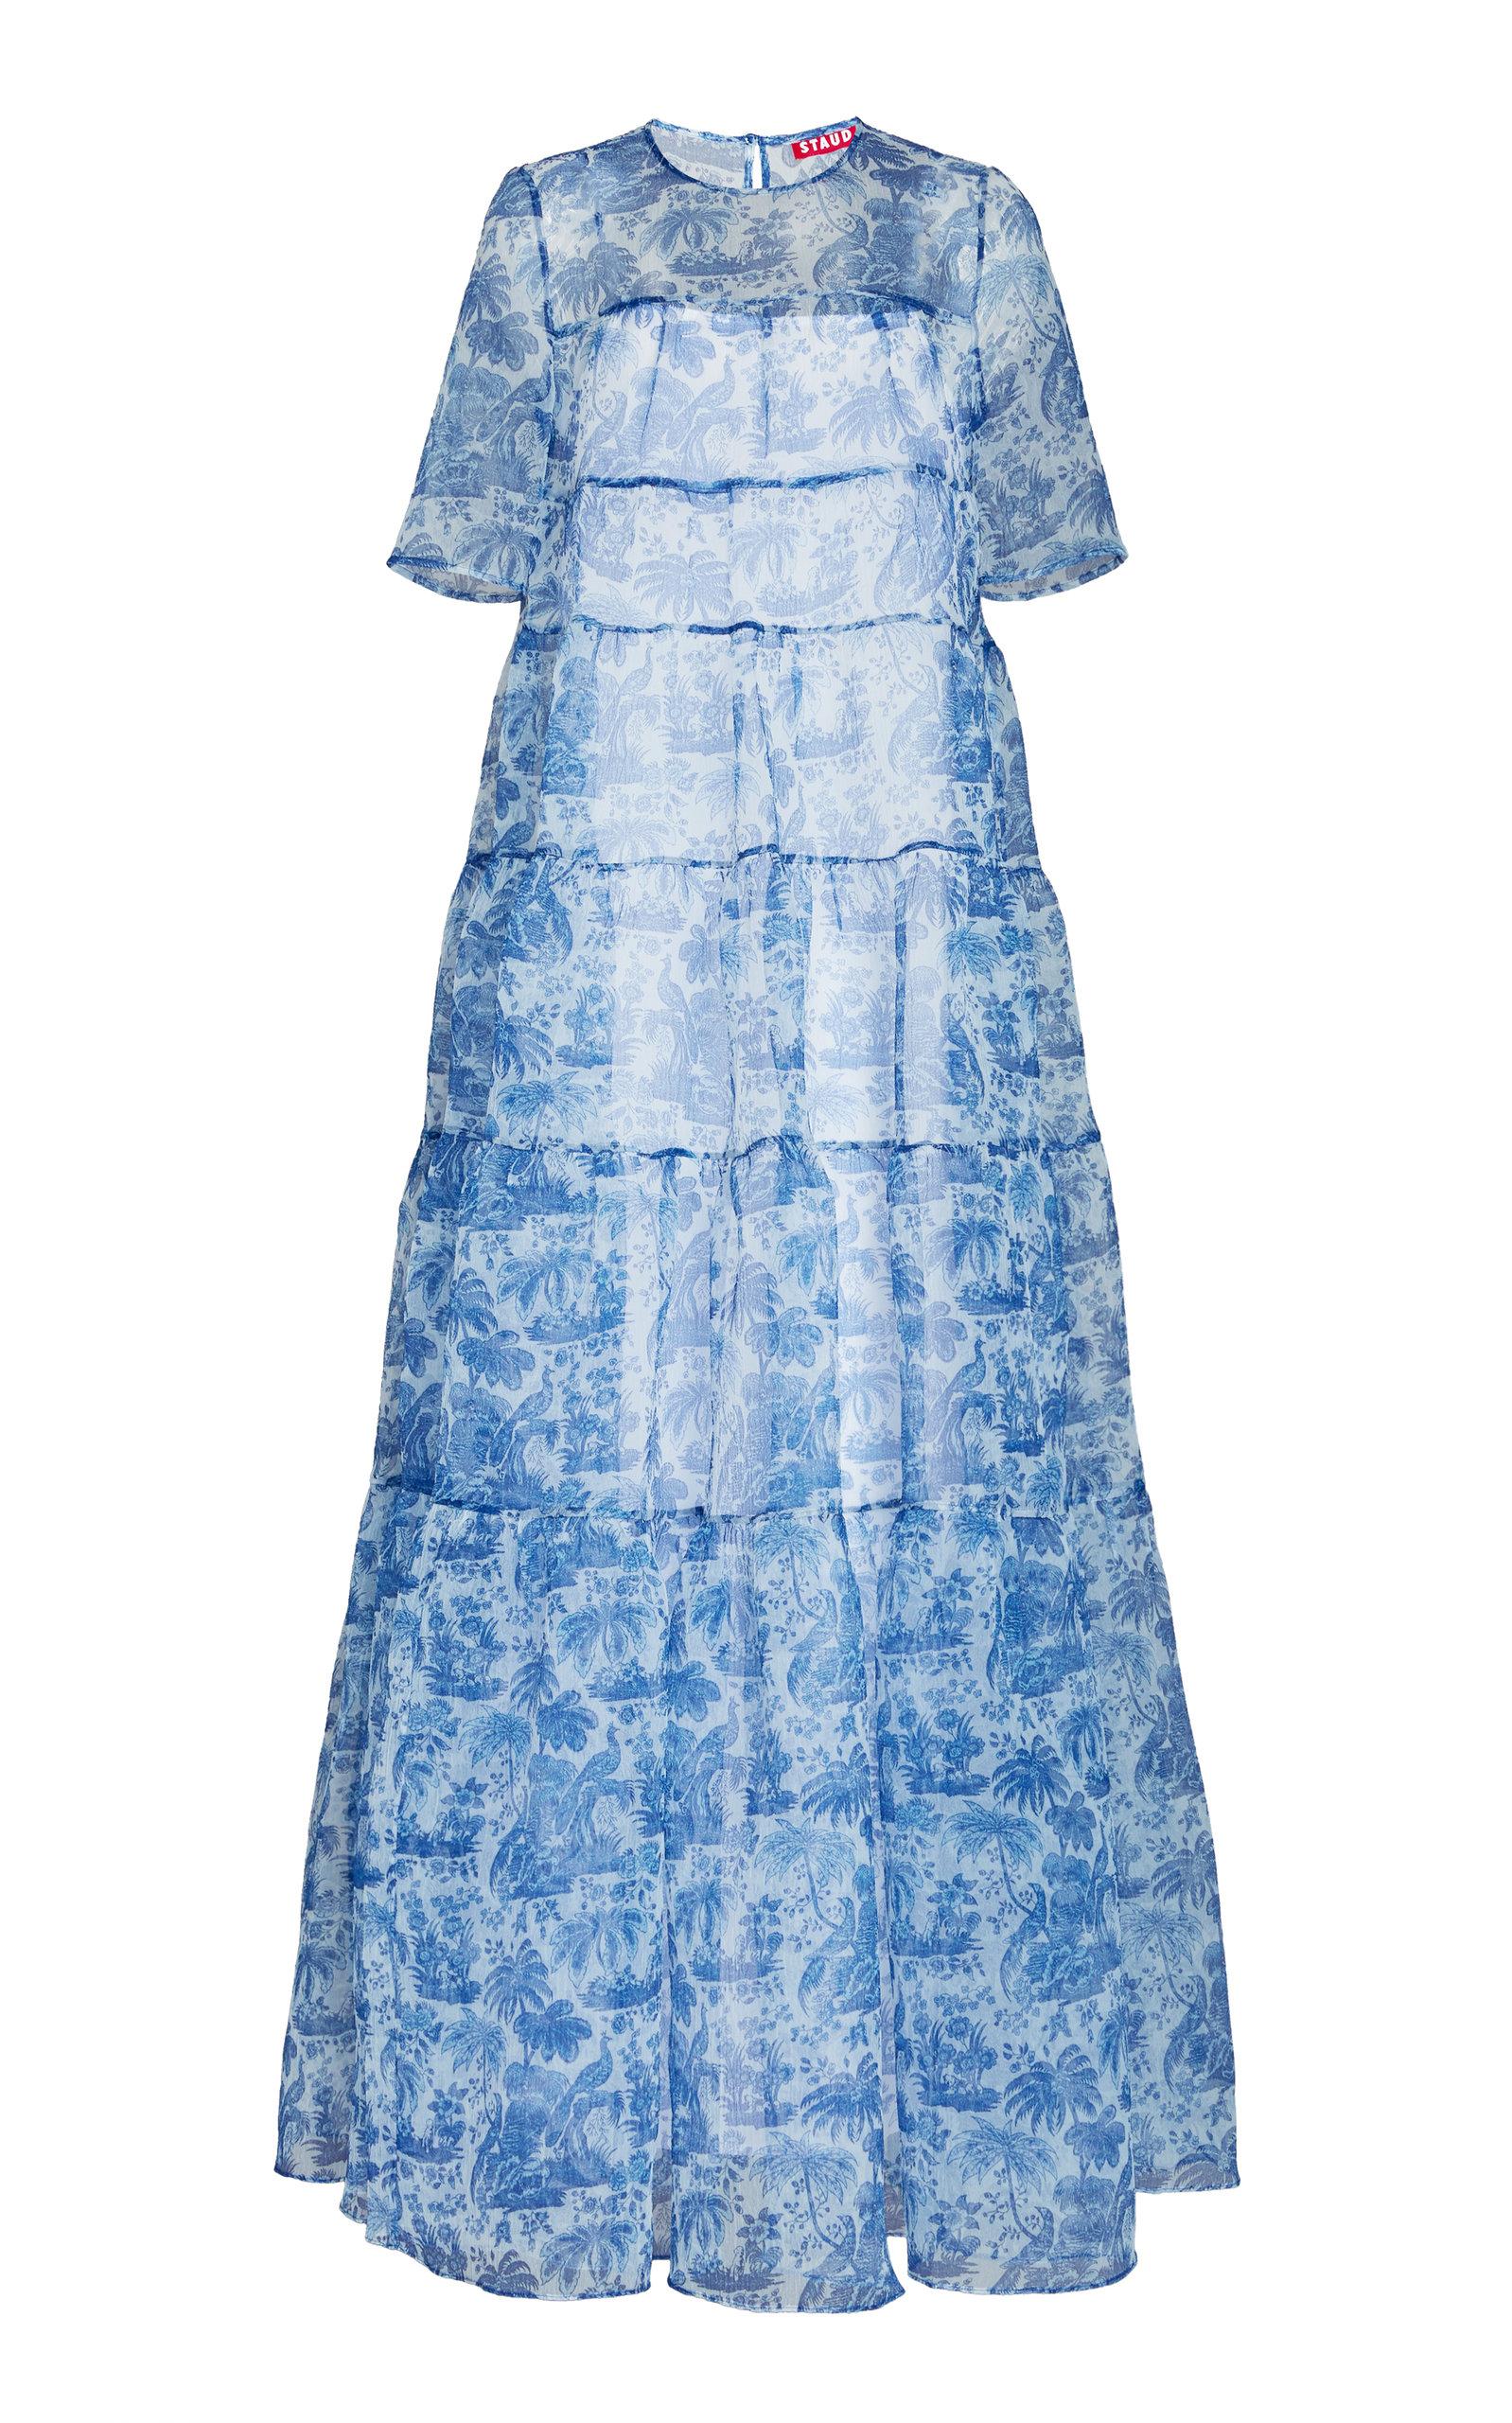 Buy Staud Hyacinth Crepe-Organza Dress online, shop Staud at the best price